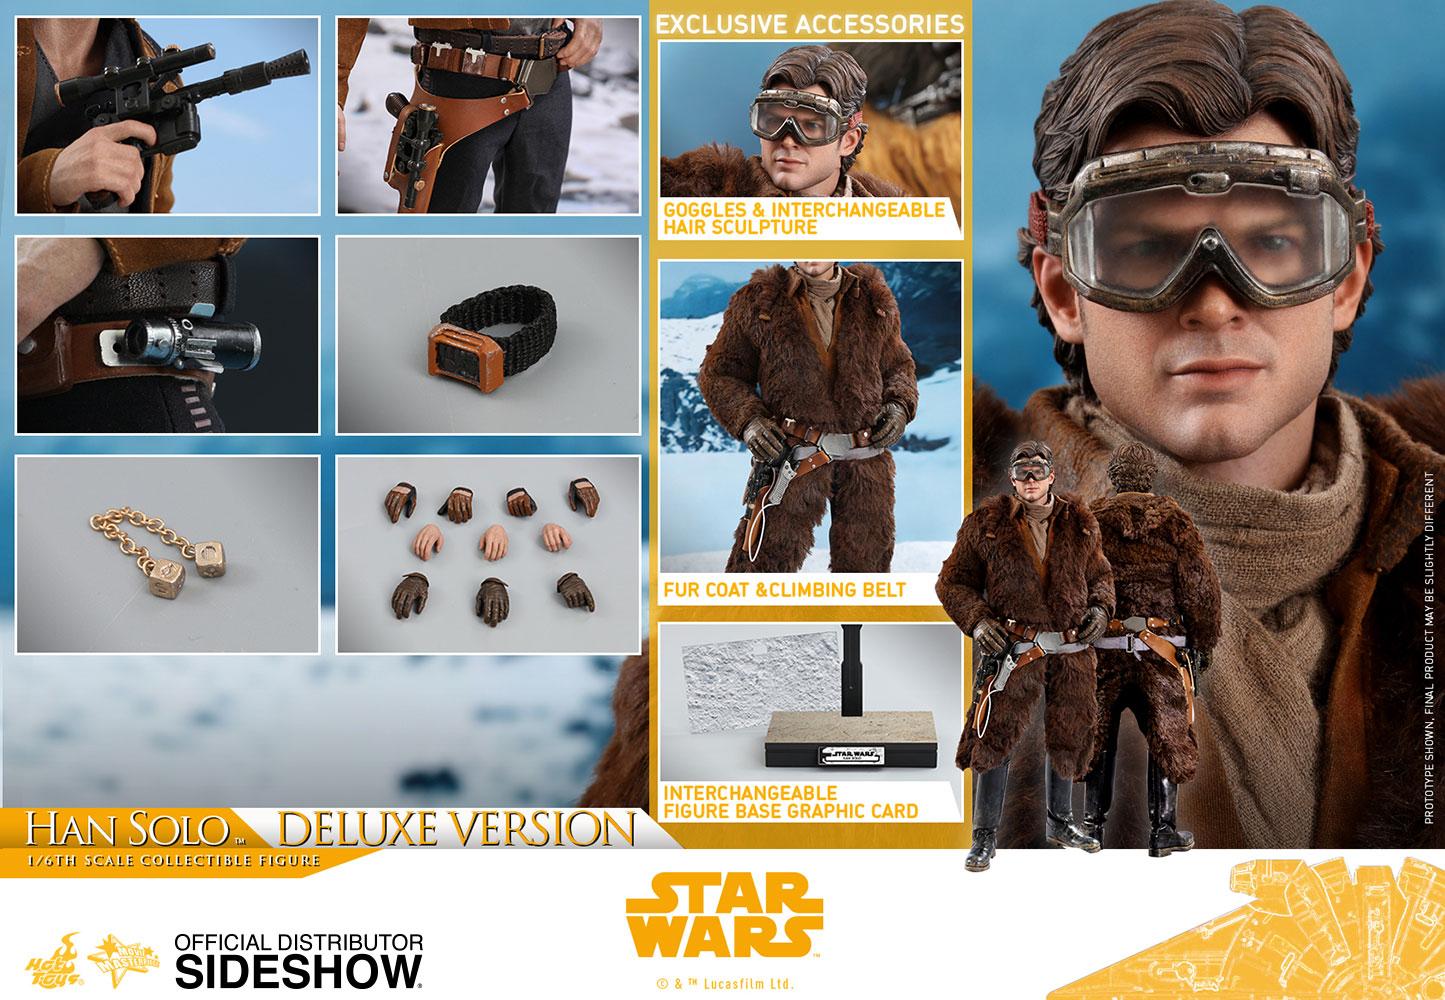 Han Solo Hot toys